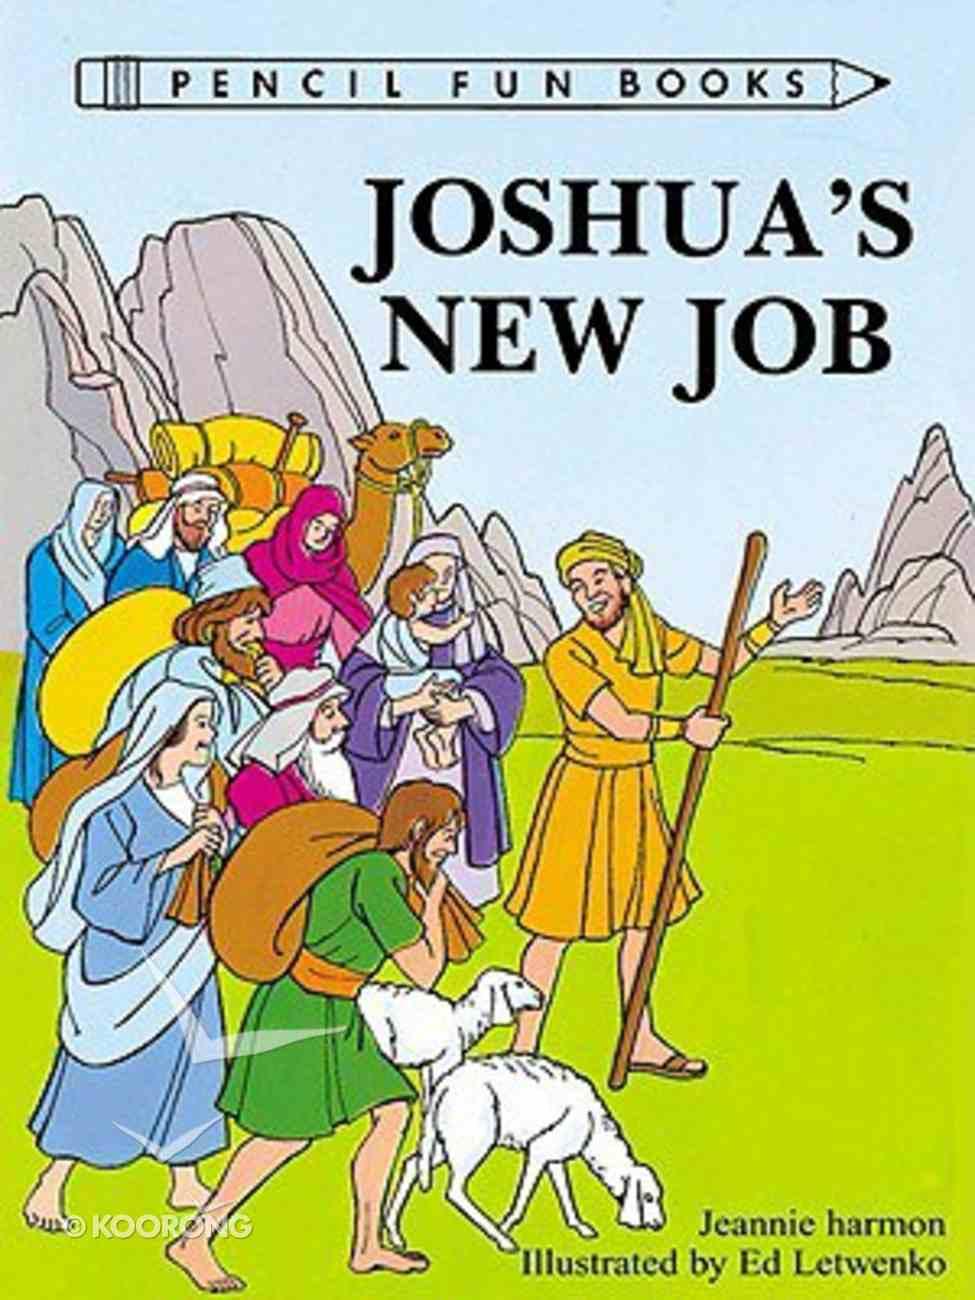 Joshua's New Job (Pencil Fun Books Series) Paperback